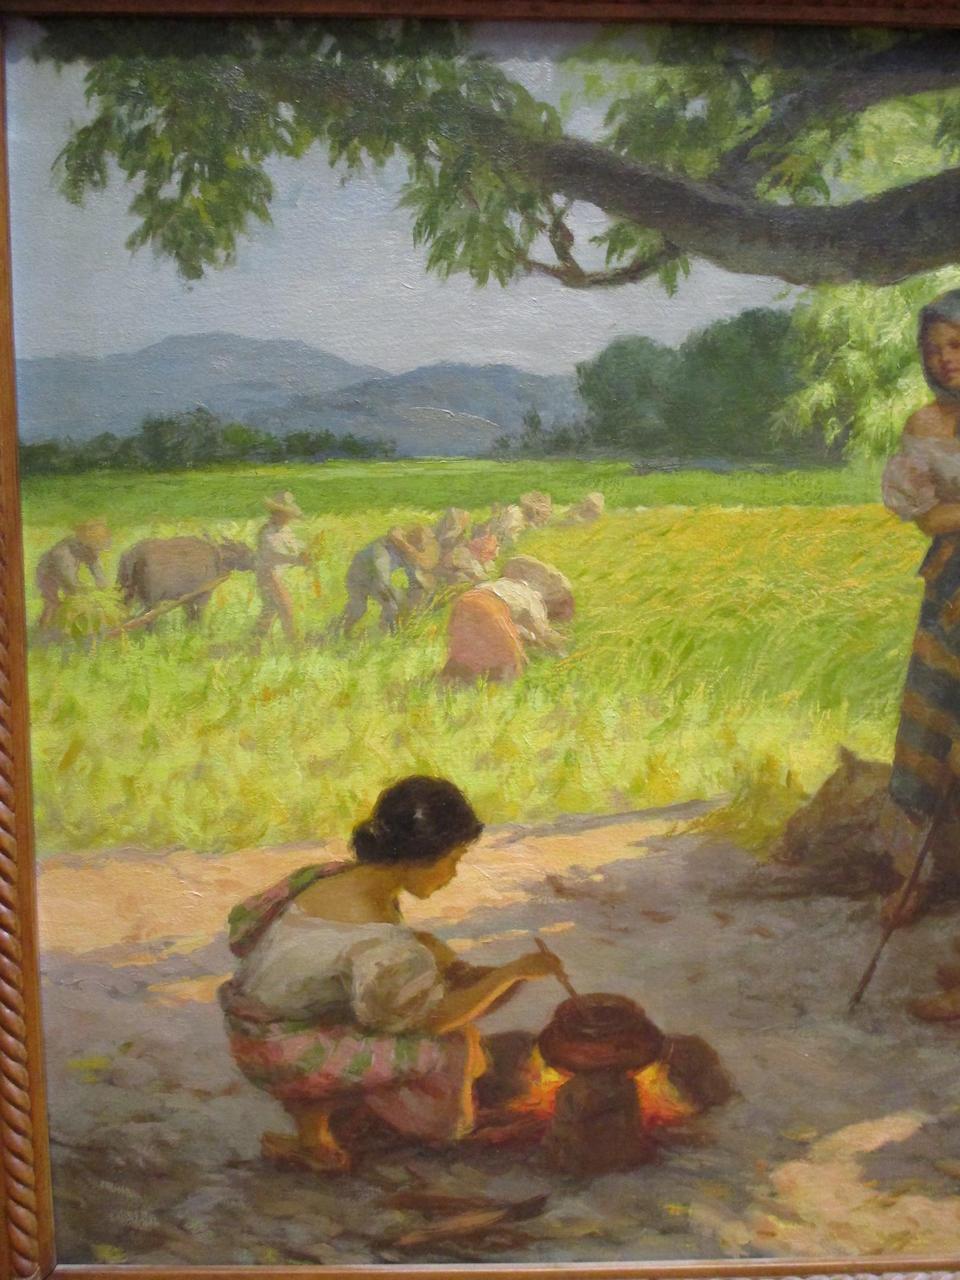 Fernando Amorsolo Y Cueto (Philippines 1892-1972)  A Family Resting Under a Mango Tree, 1951